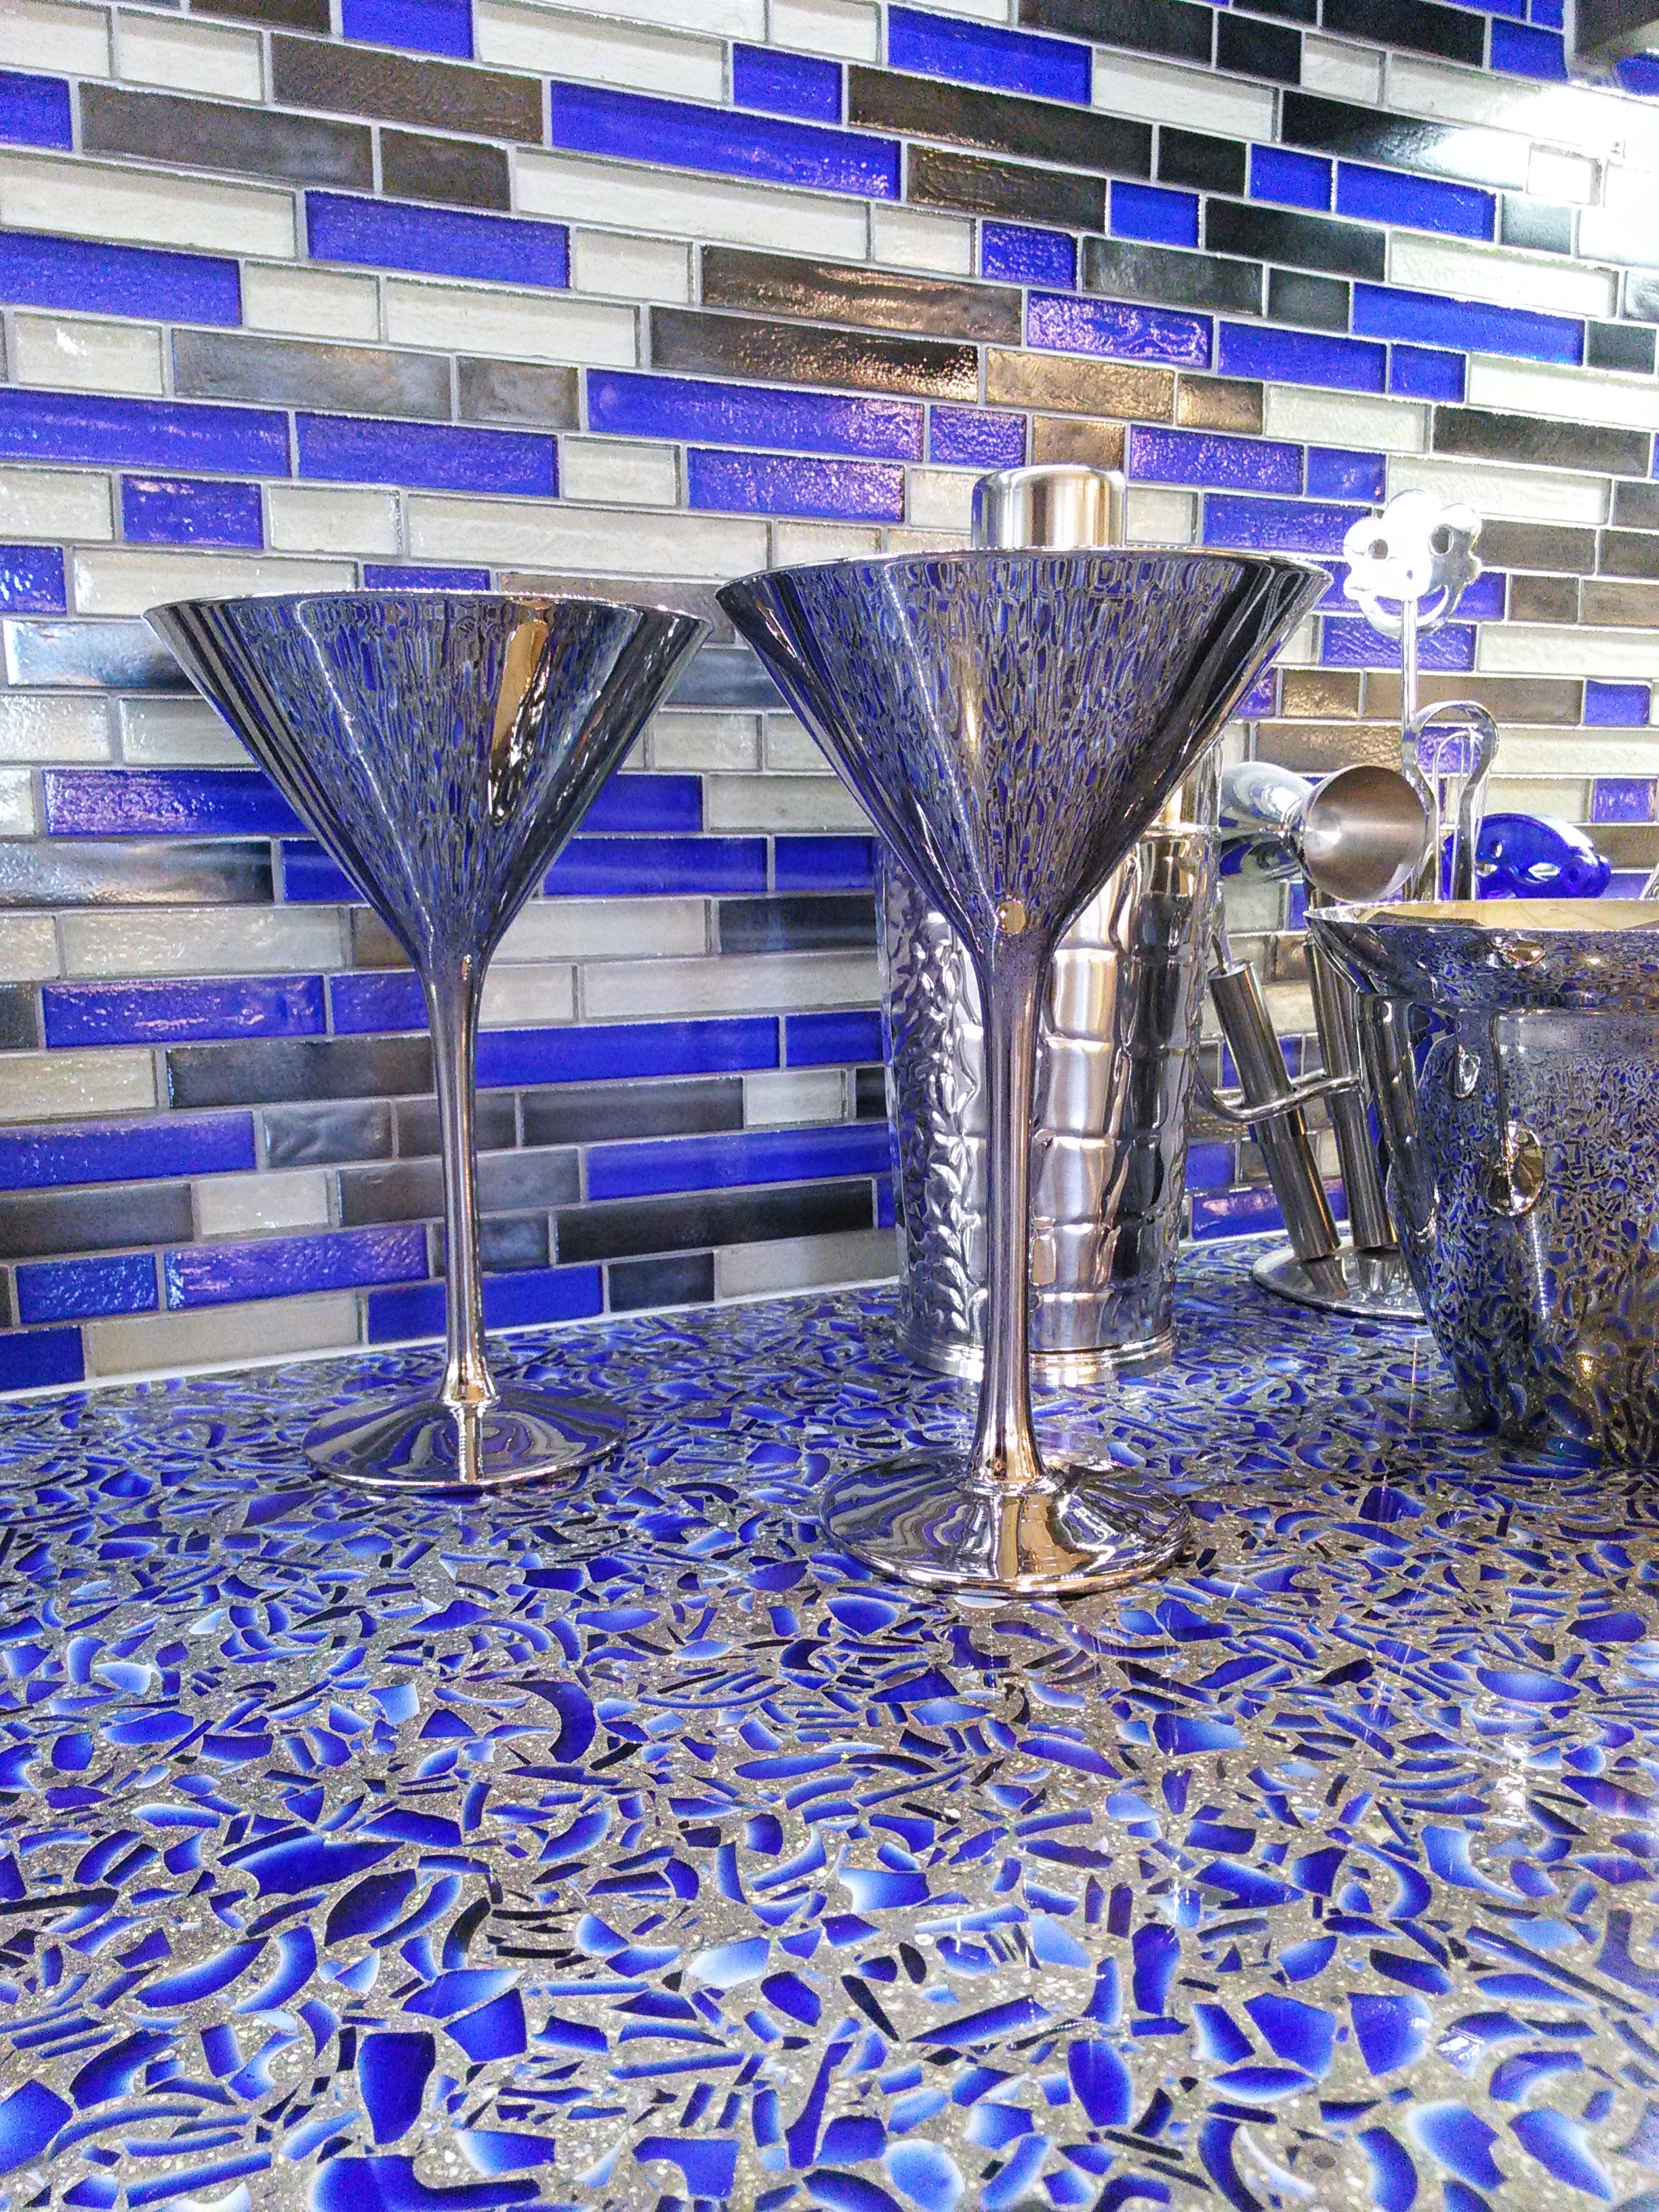 Coastal_Kitchen_Interiors_Cobalt_Skyy_UltraCraft_CermaicMatrix_display_3